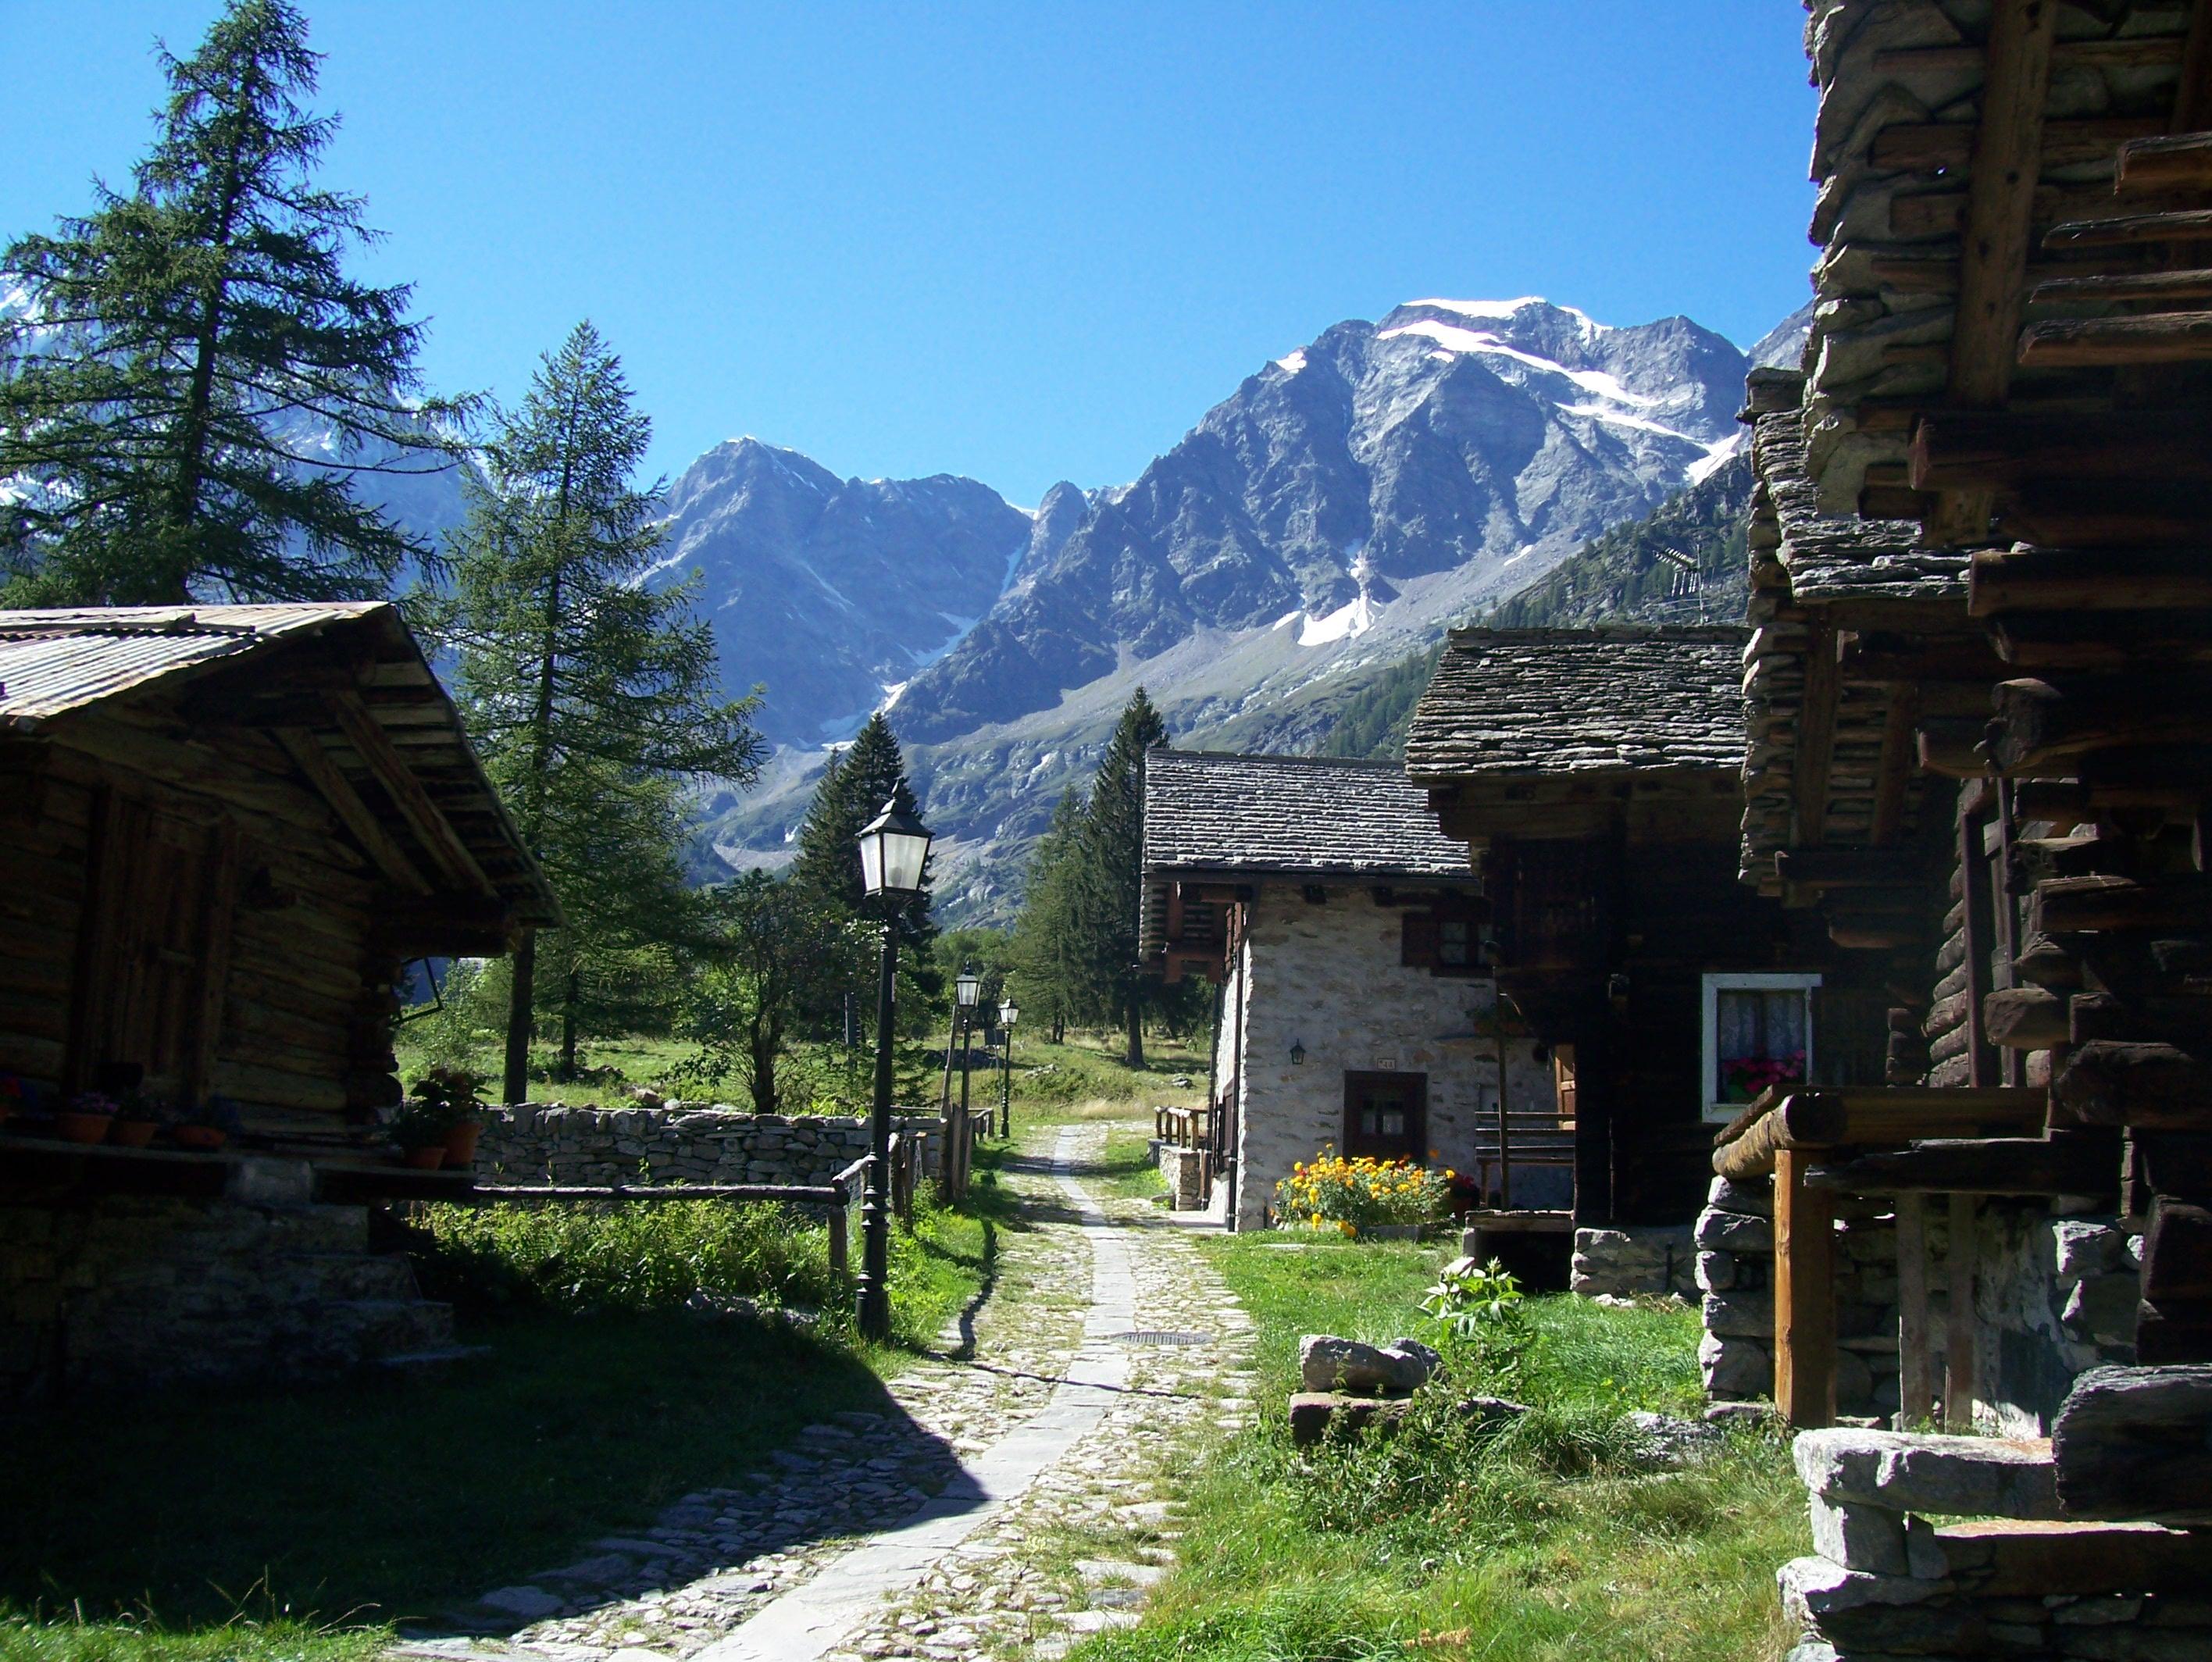 Il vecchio dorf walser di Macugnaga Monte Rosa